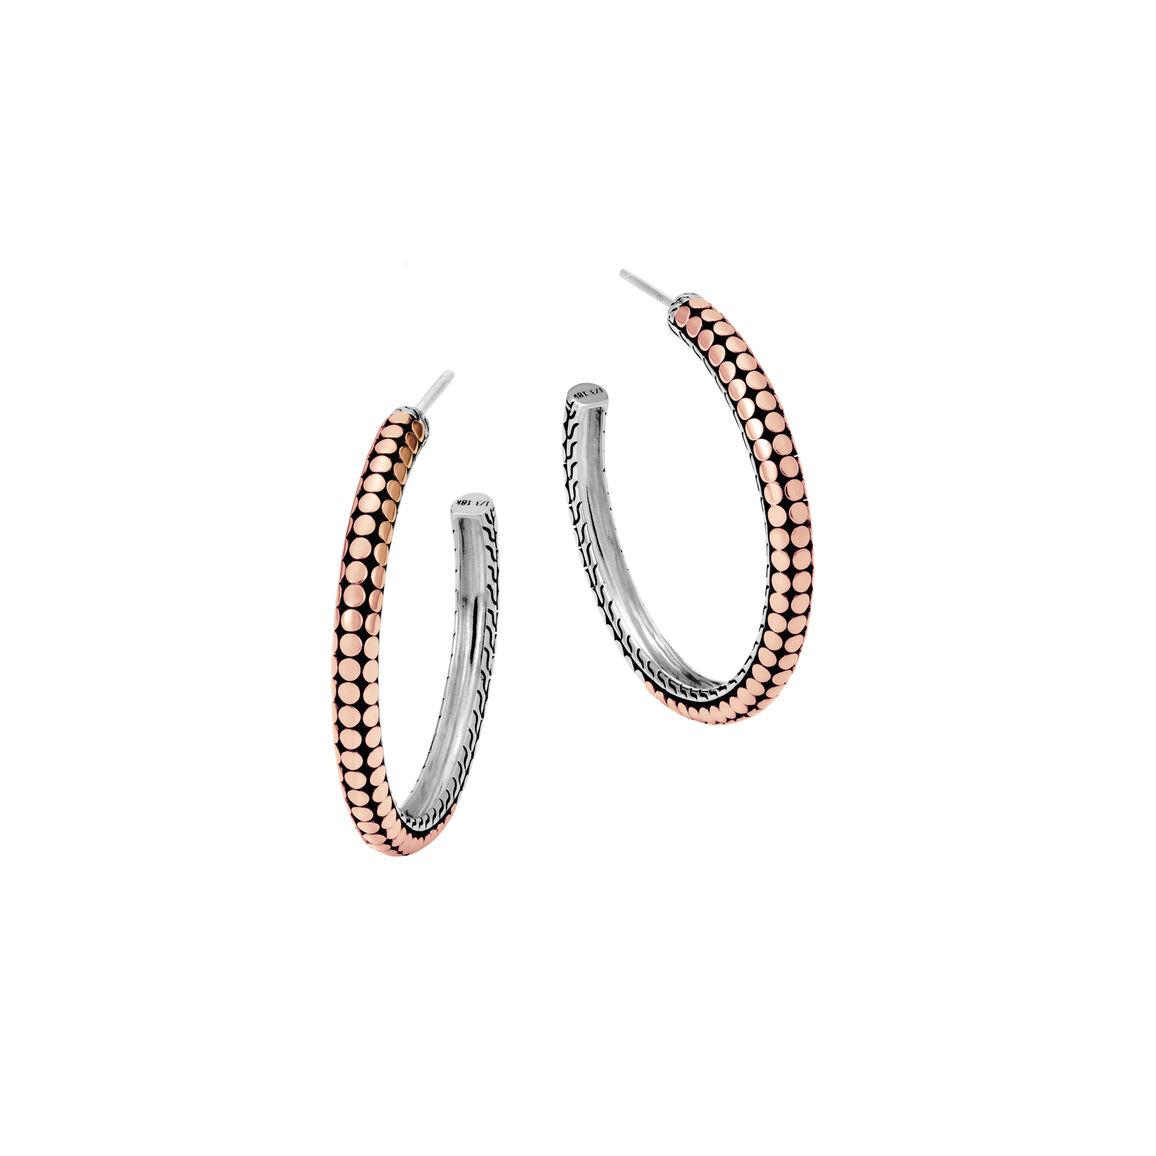 Dot Medium Hoop Earring in Silver and 18K Rose Gold